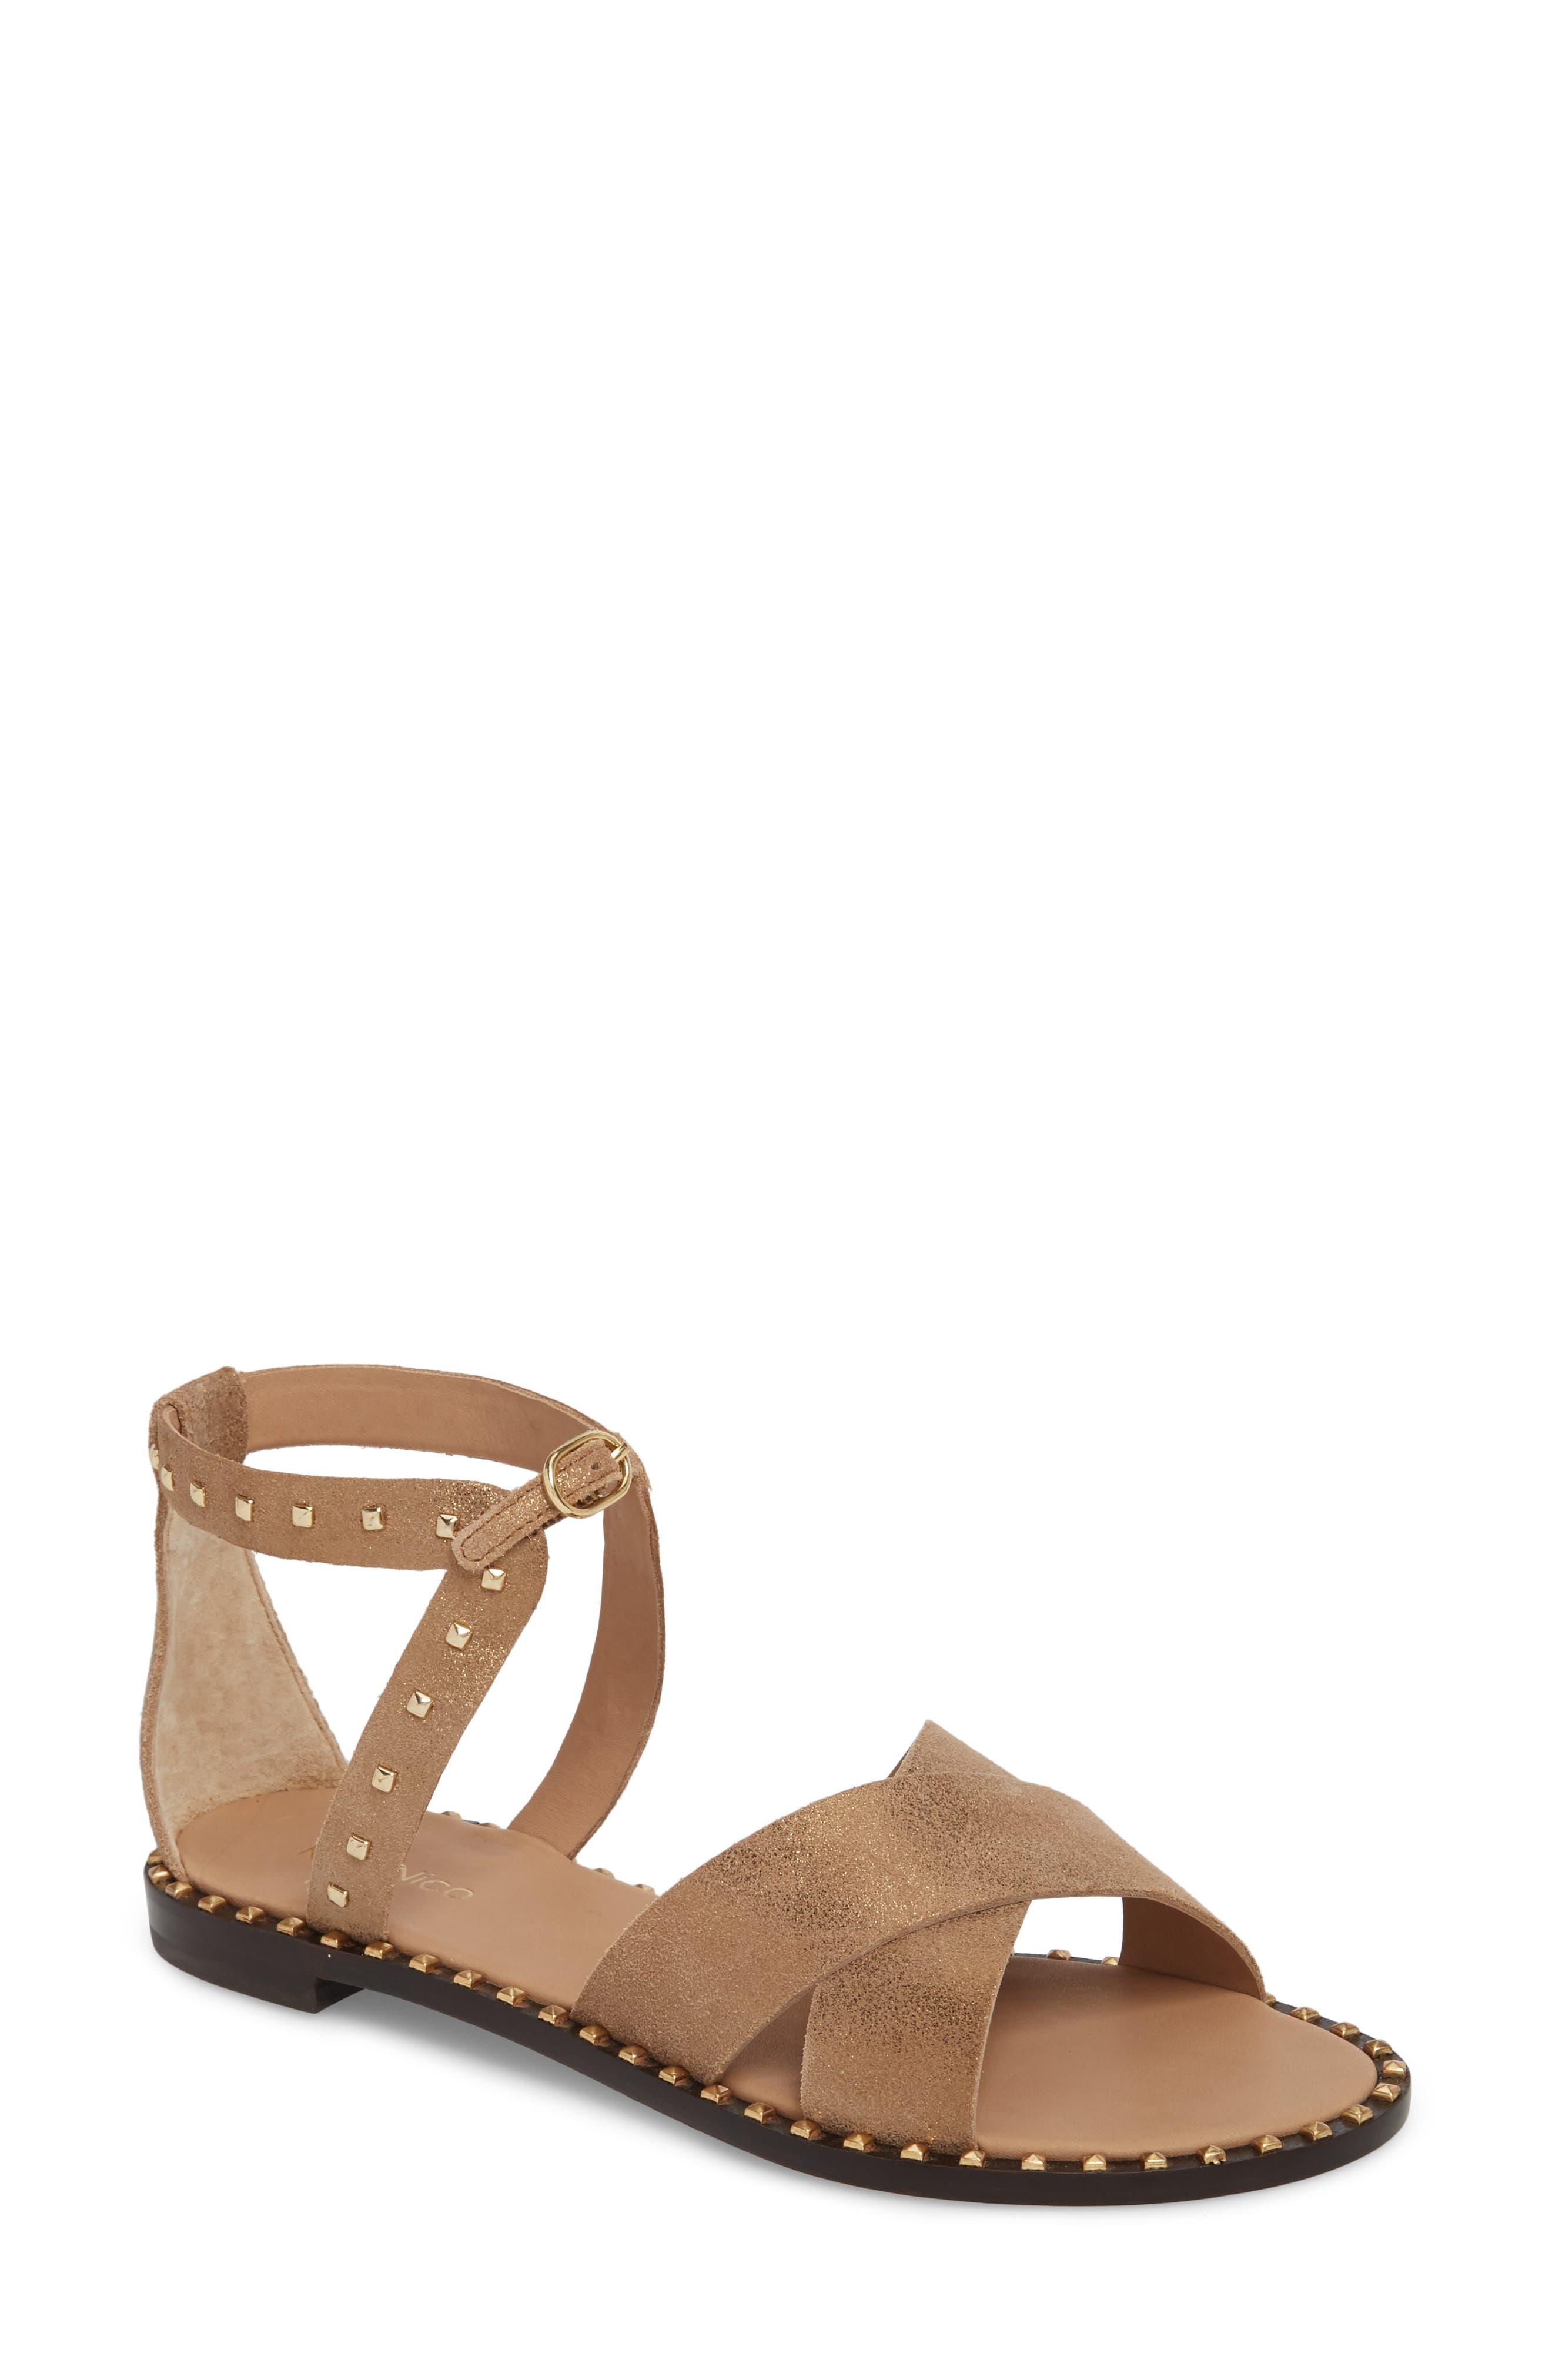 Jada Sandal,                         Main,                         color, Bronze Suede